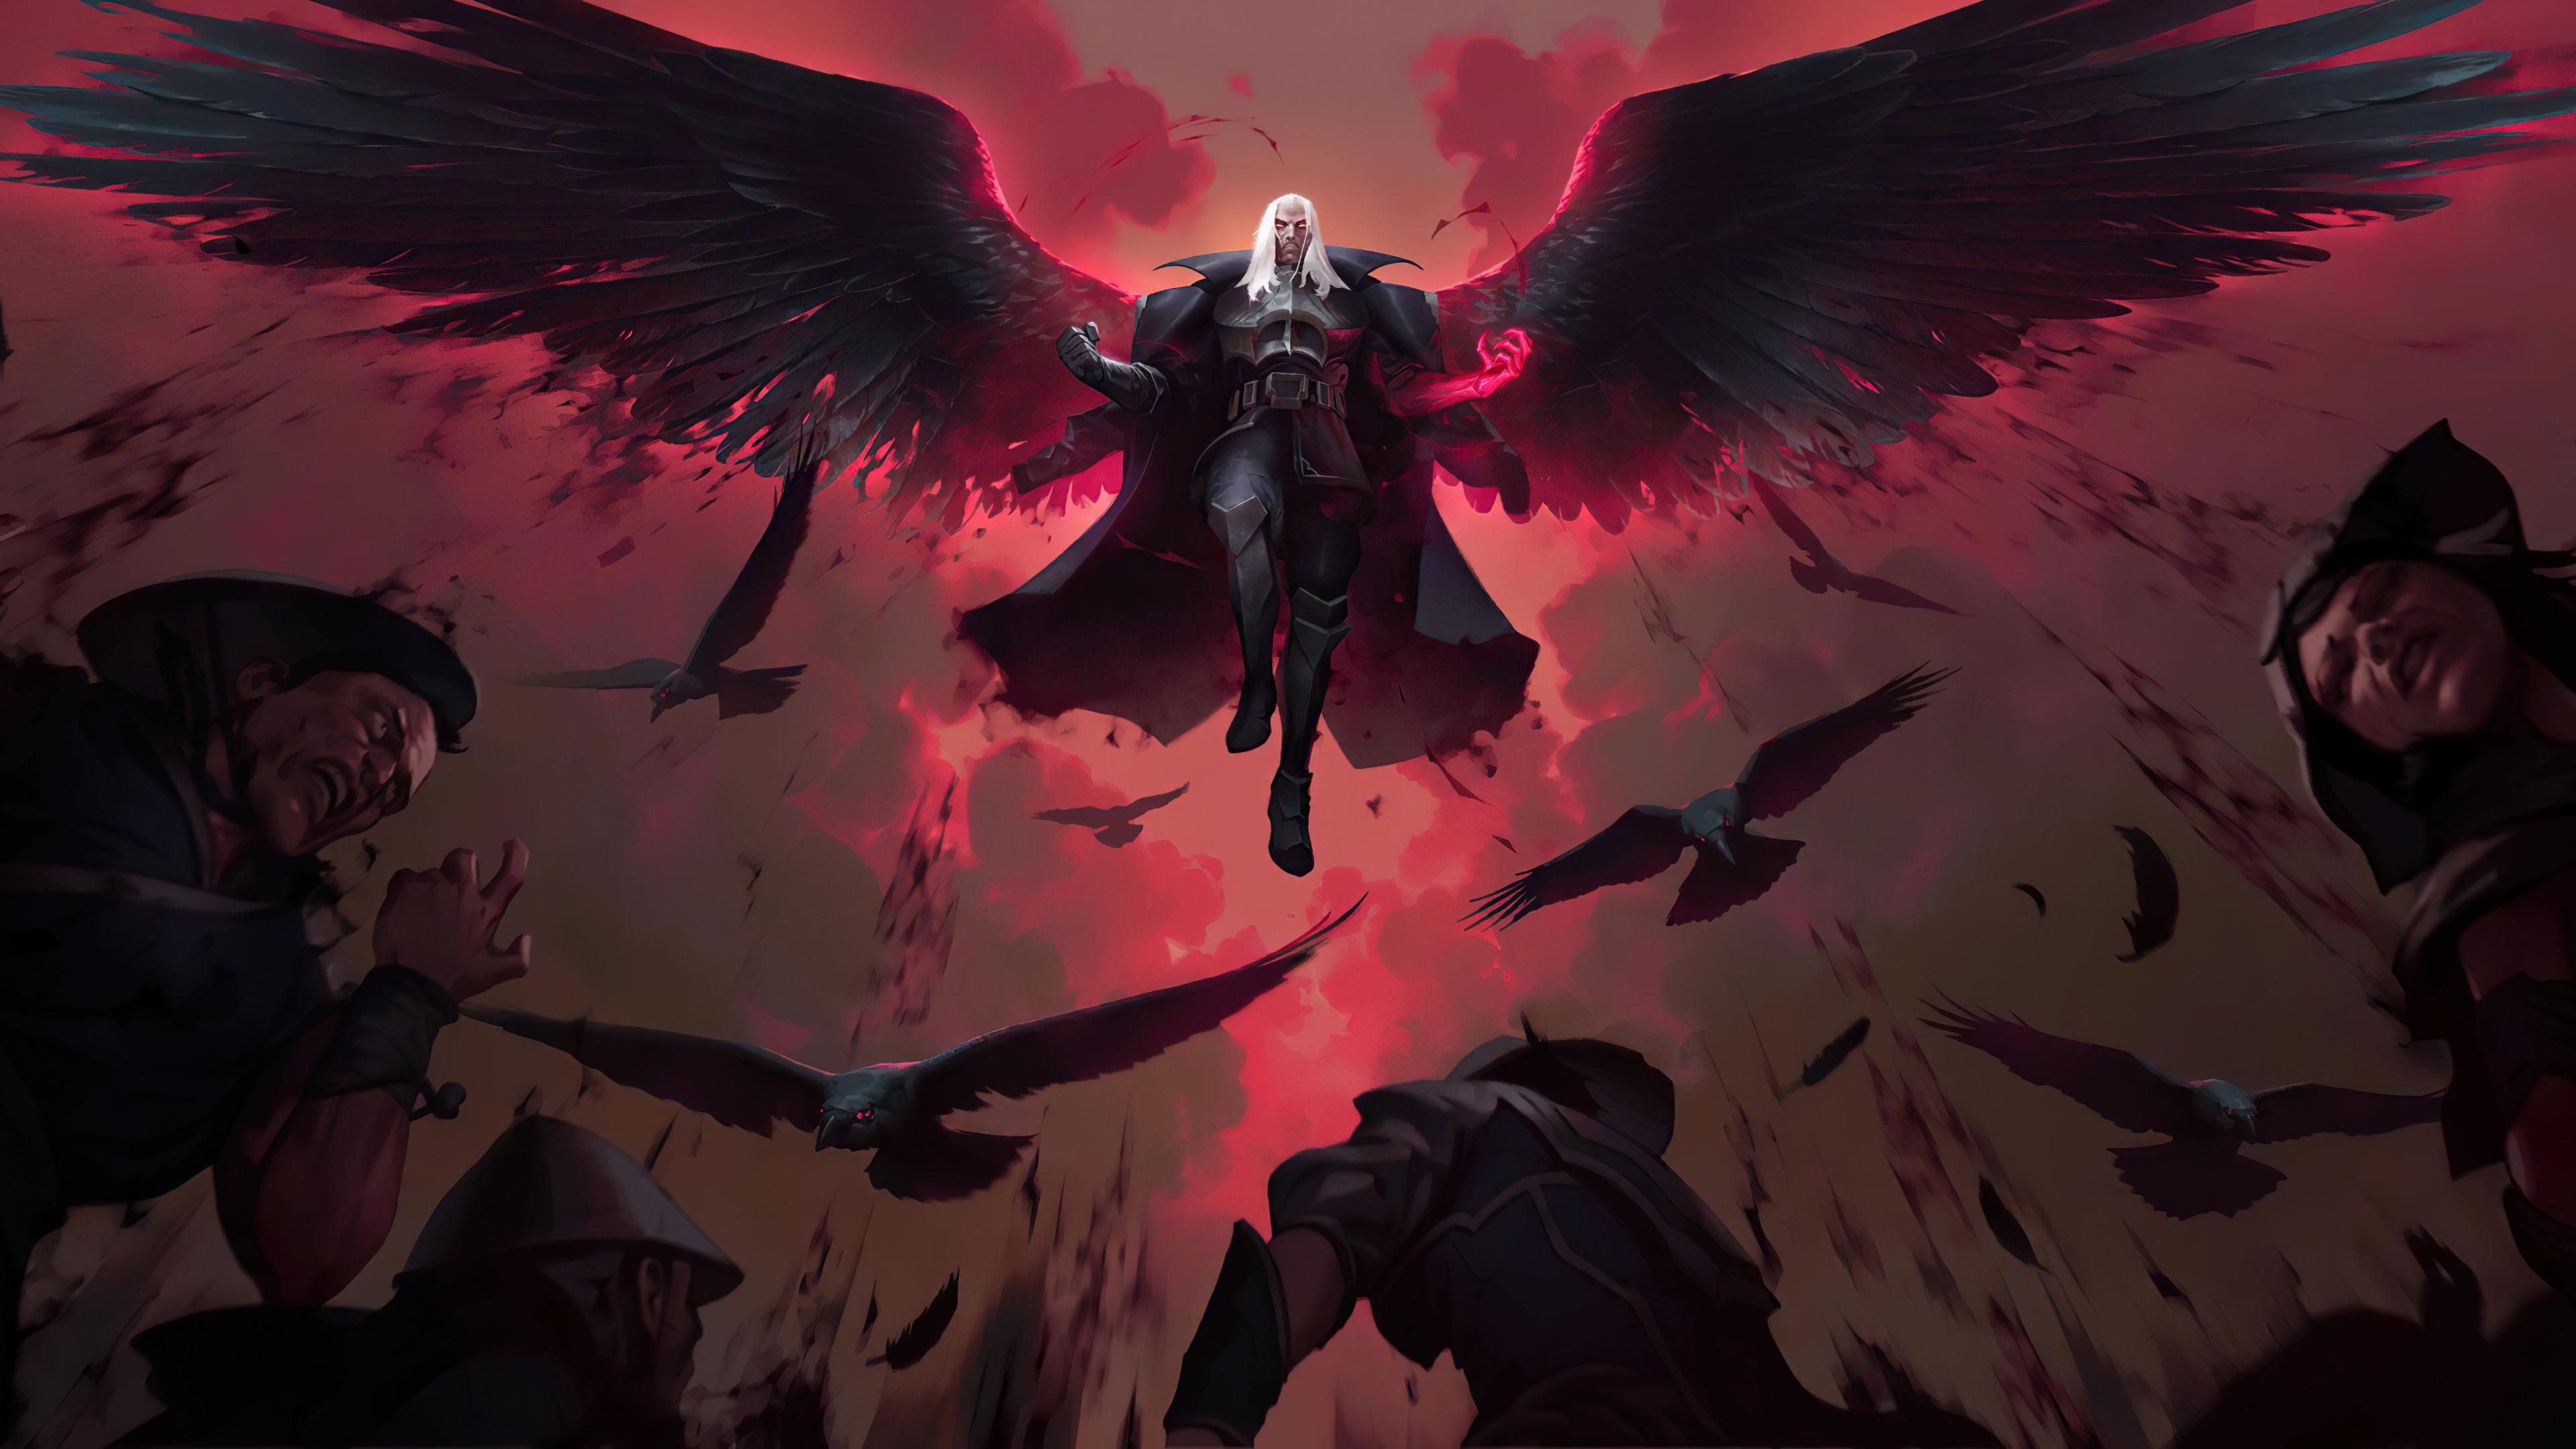 General 3840x2160 Swain Swain (League of Legends) Legends of Runeterra video games PC gaming wings fantasy art